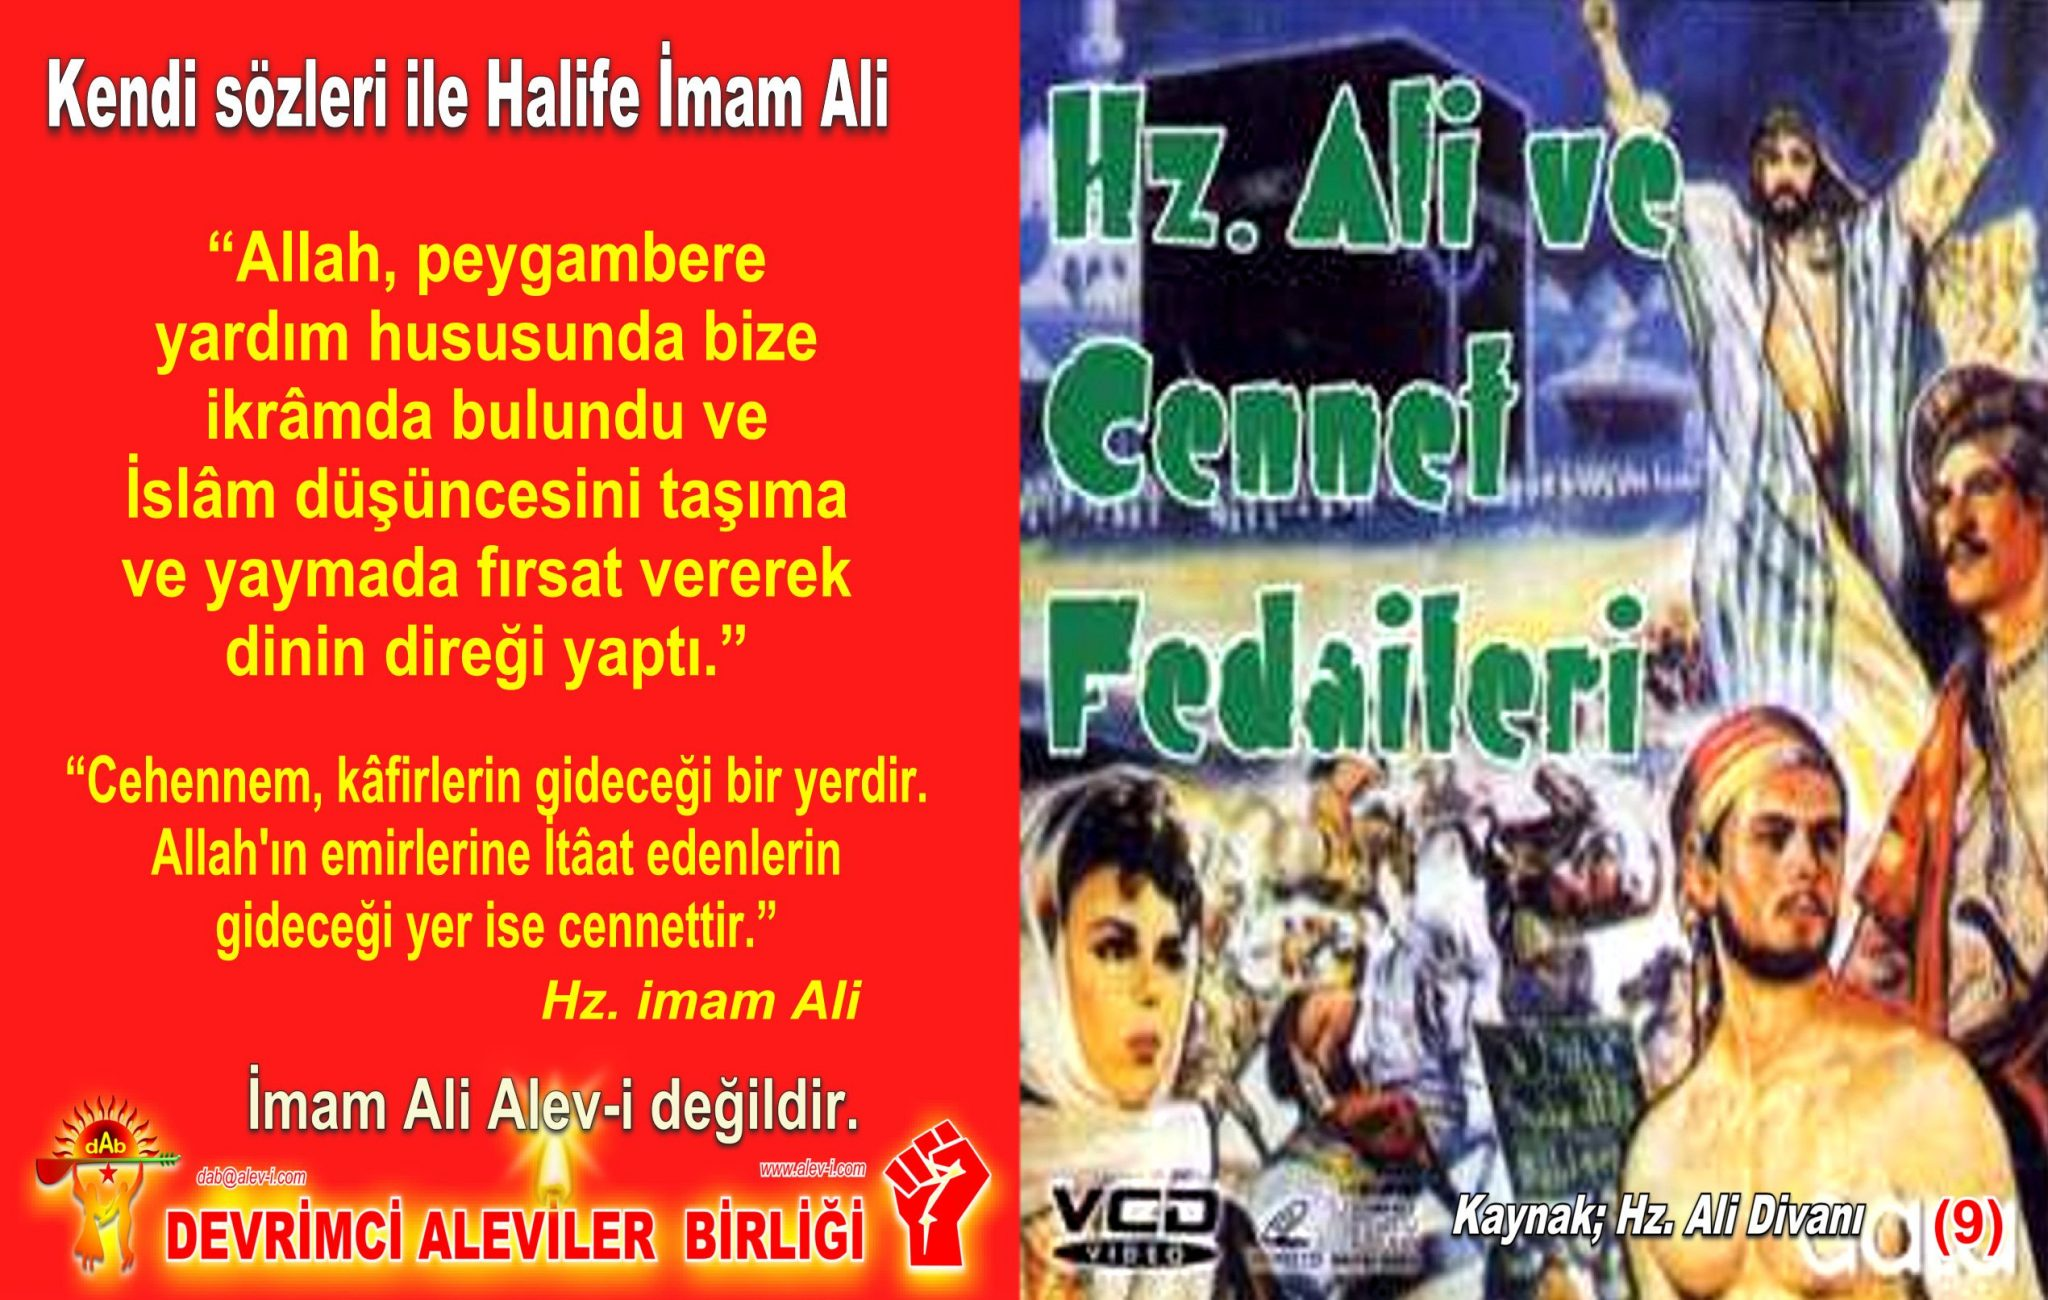 9 Hz imam Ali divani Alevi bektasi kizilbas pir sultan devrimci aleviler birligi DAB Feramuz Sah Acar